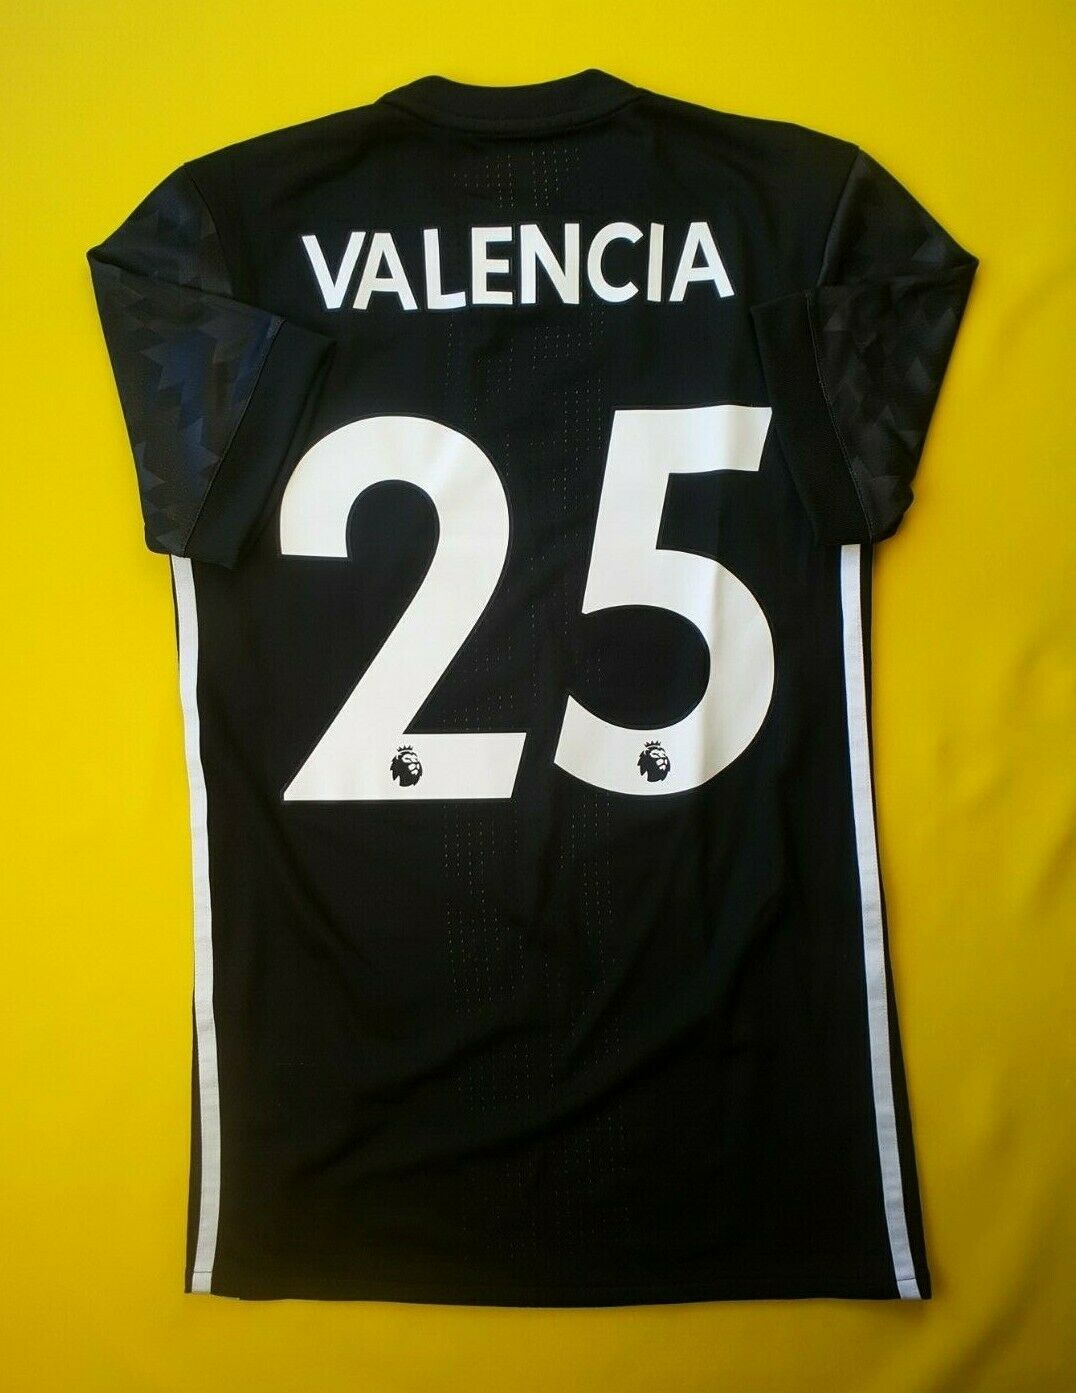 5+ 5 Valencia Manchester United adizero jersey XS 2018 shirt B30978 Adidas ig93